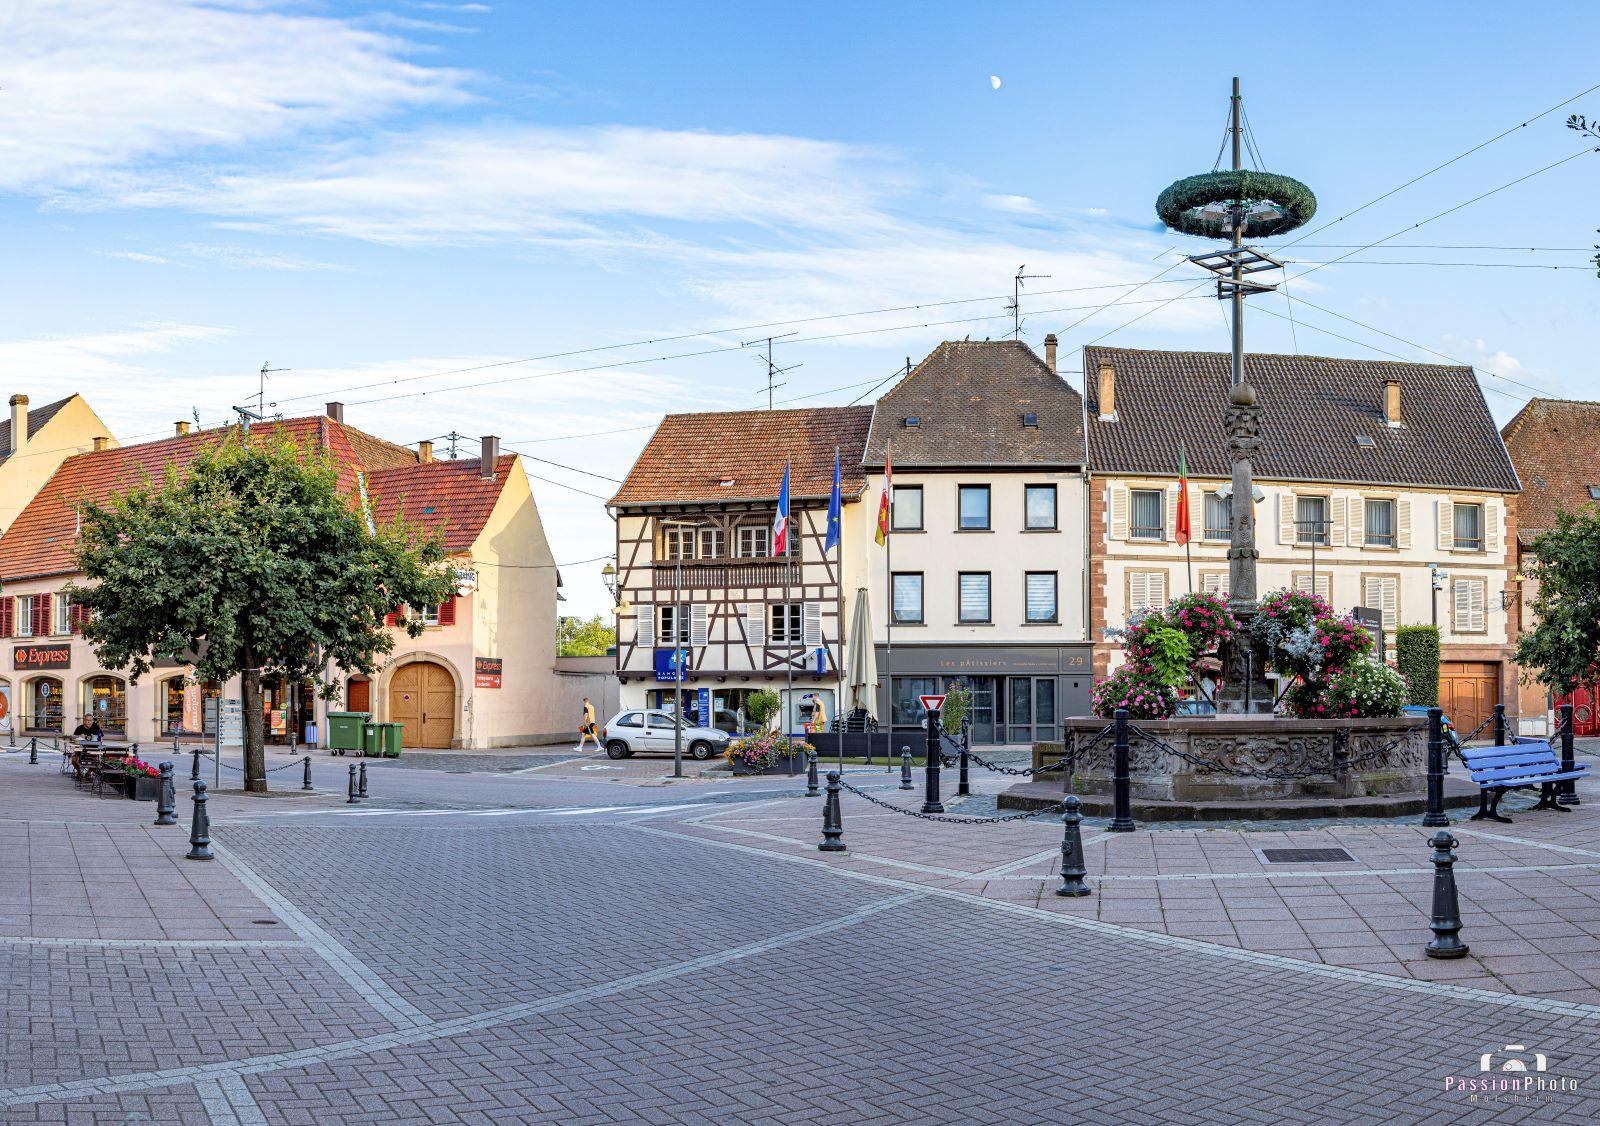 https://apps.tourisme-alsace.info/photos/molsheim/photos/218006745_1.jpg